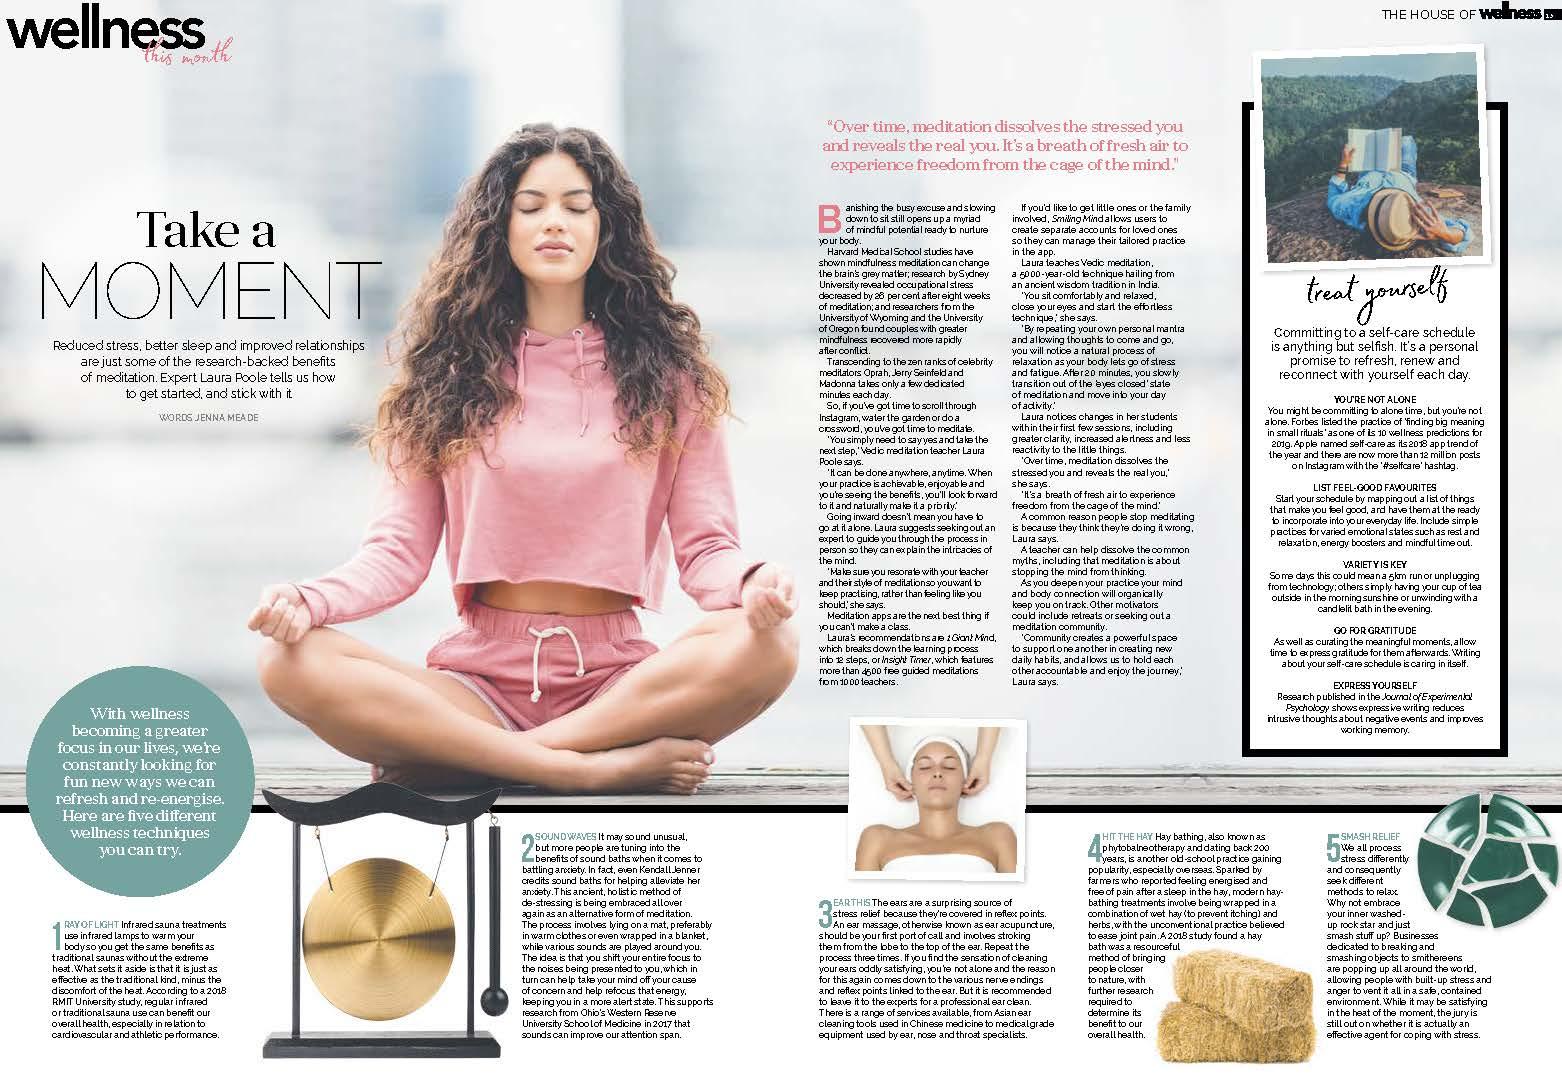 Laura Poole Vedic Meditation Wellness Article April 2019